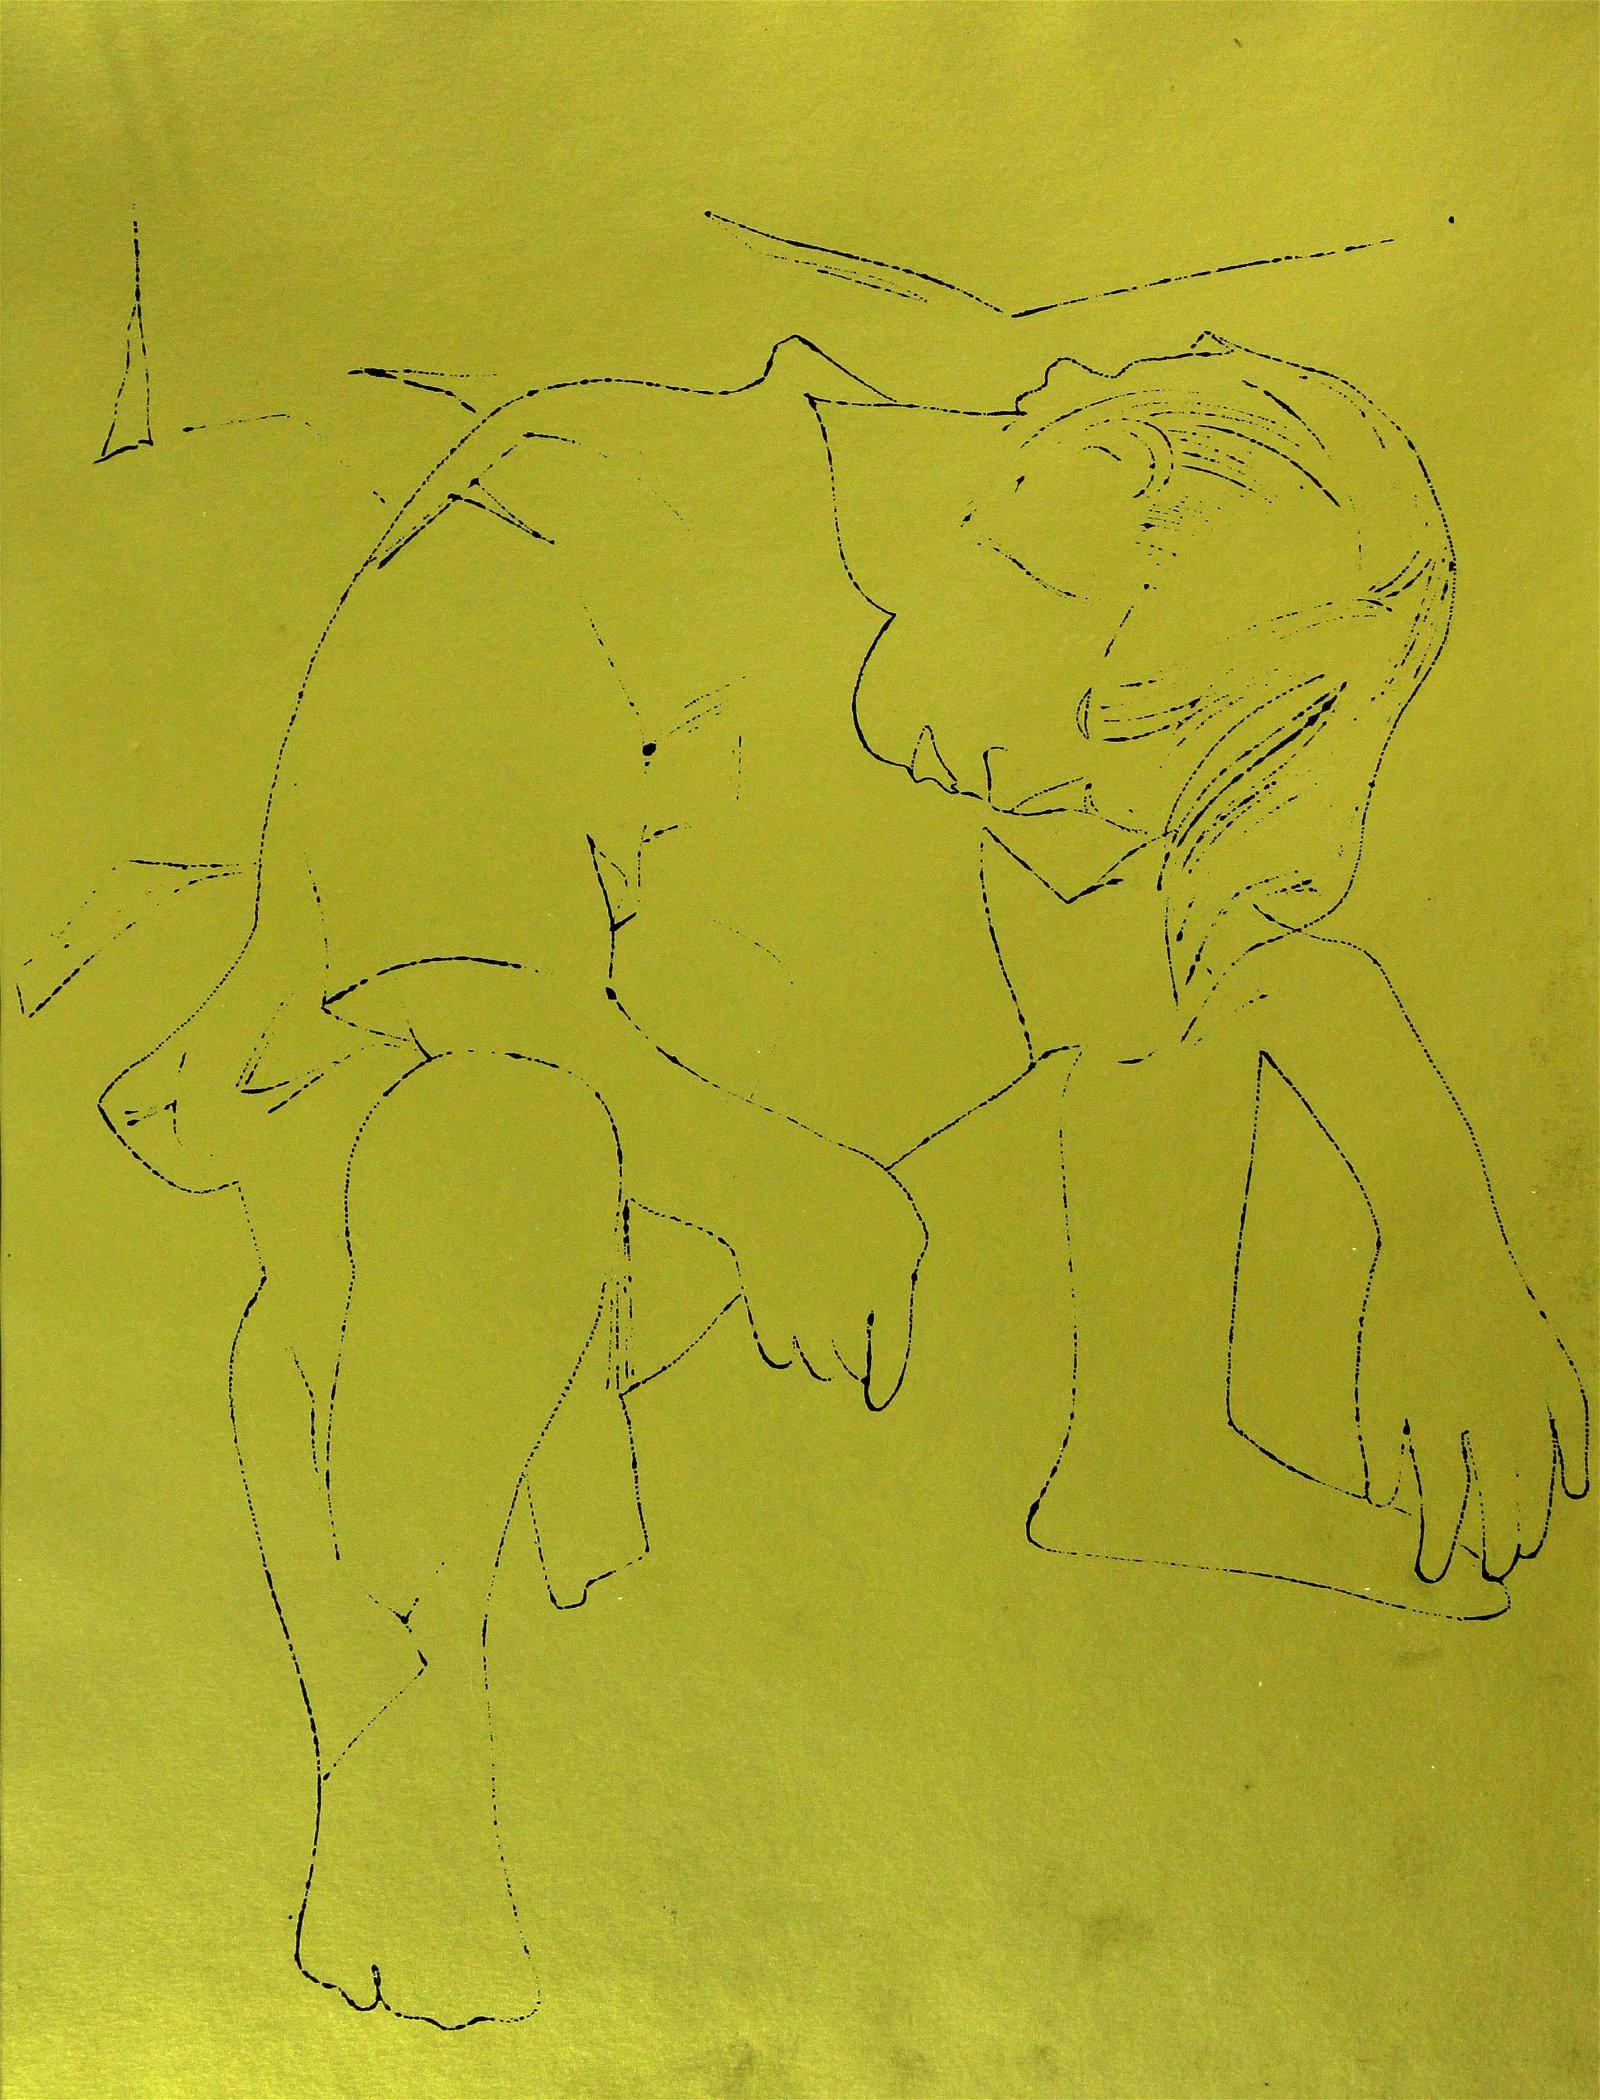 Andy Warhol - A Gold Book III